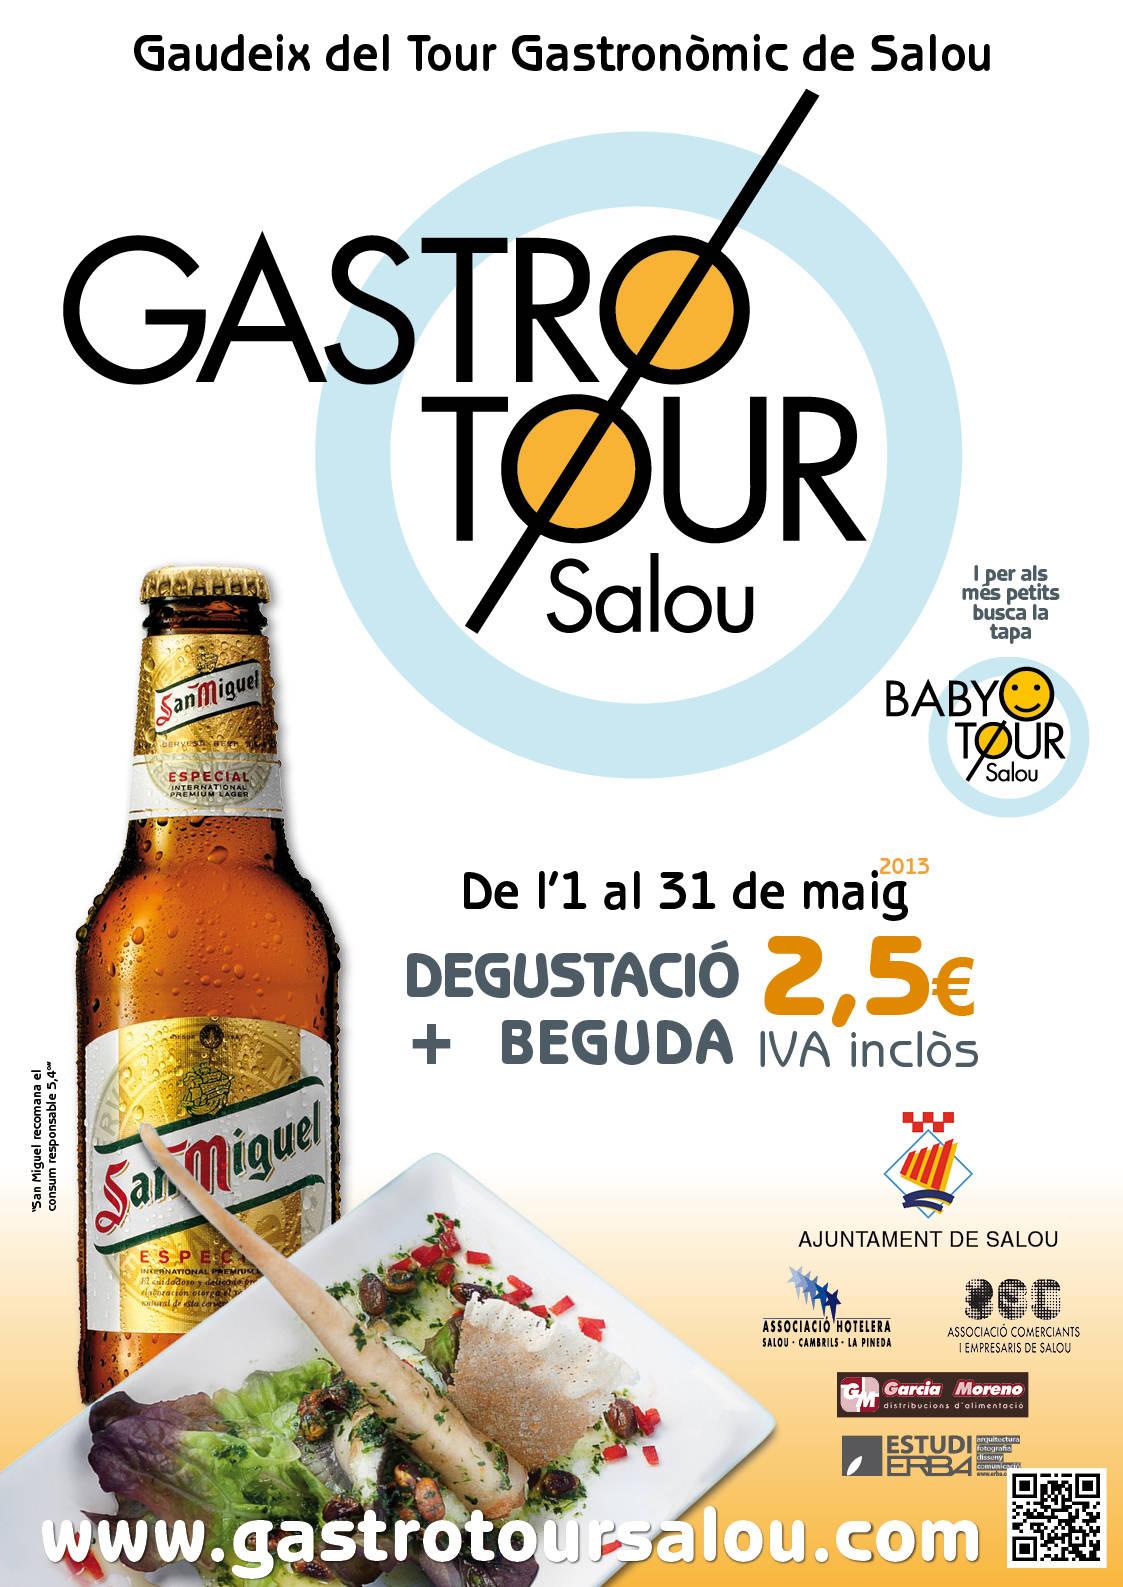 GastroTour Salou 2013